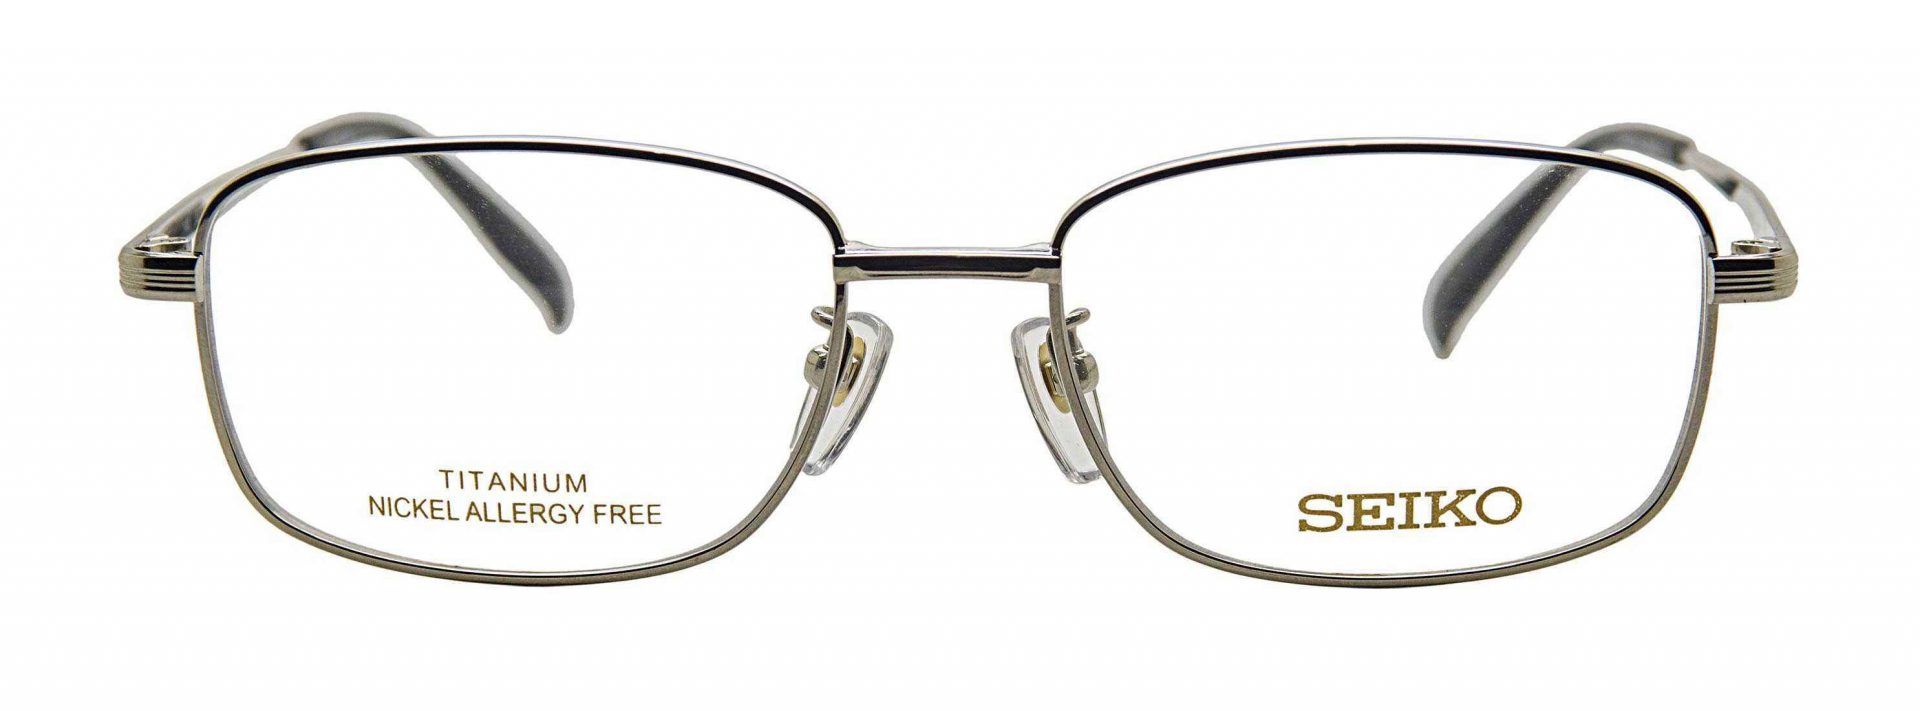 Seiko spectacles T1139 01 2970x1100 1